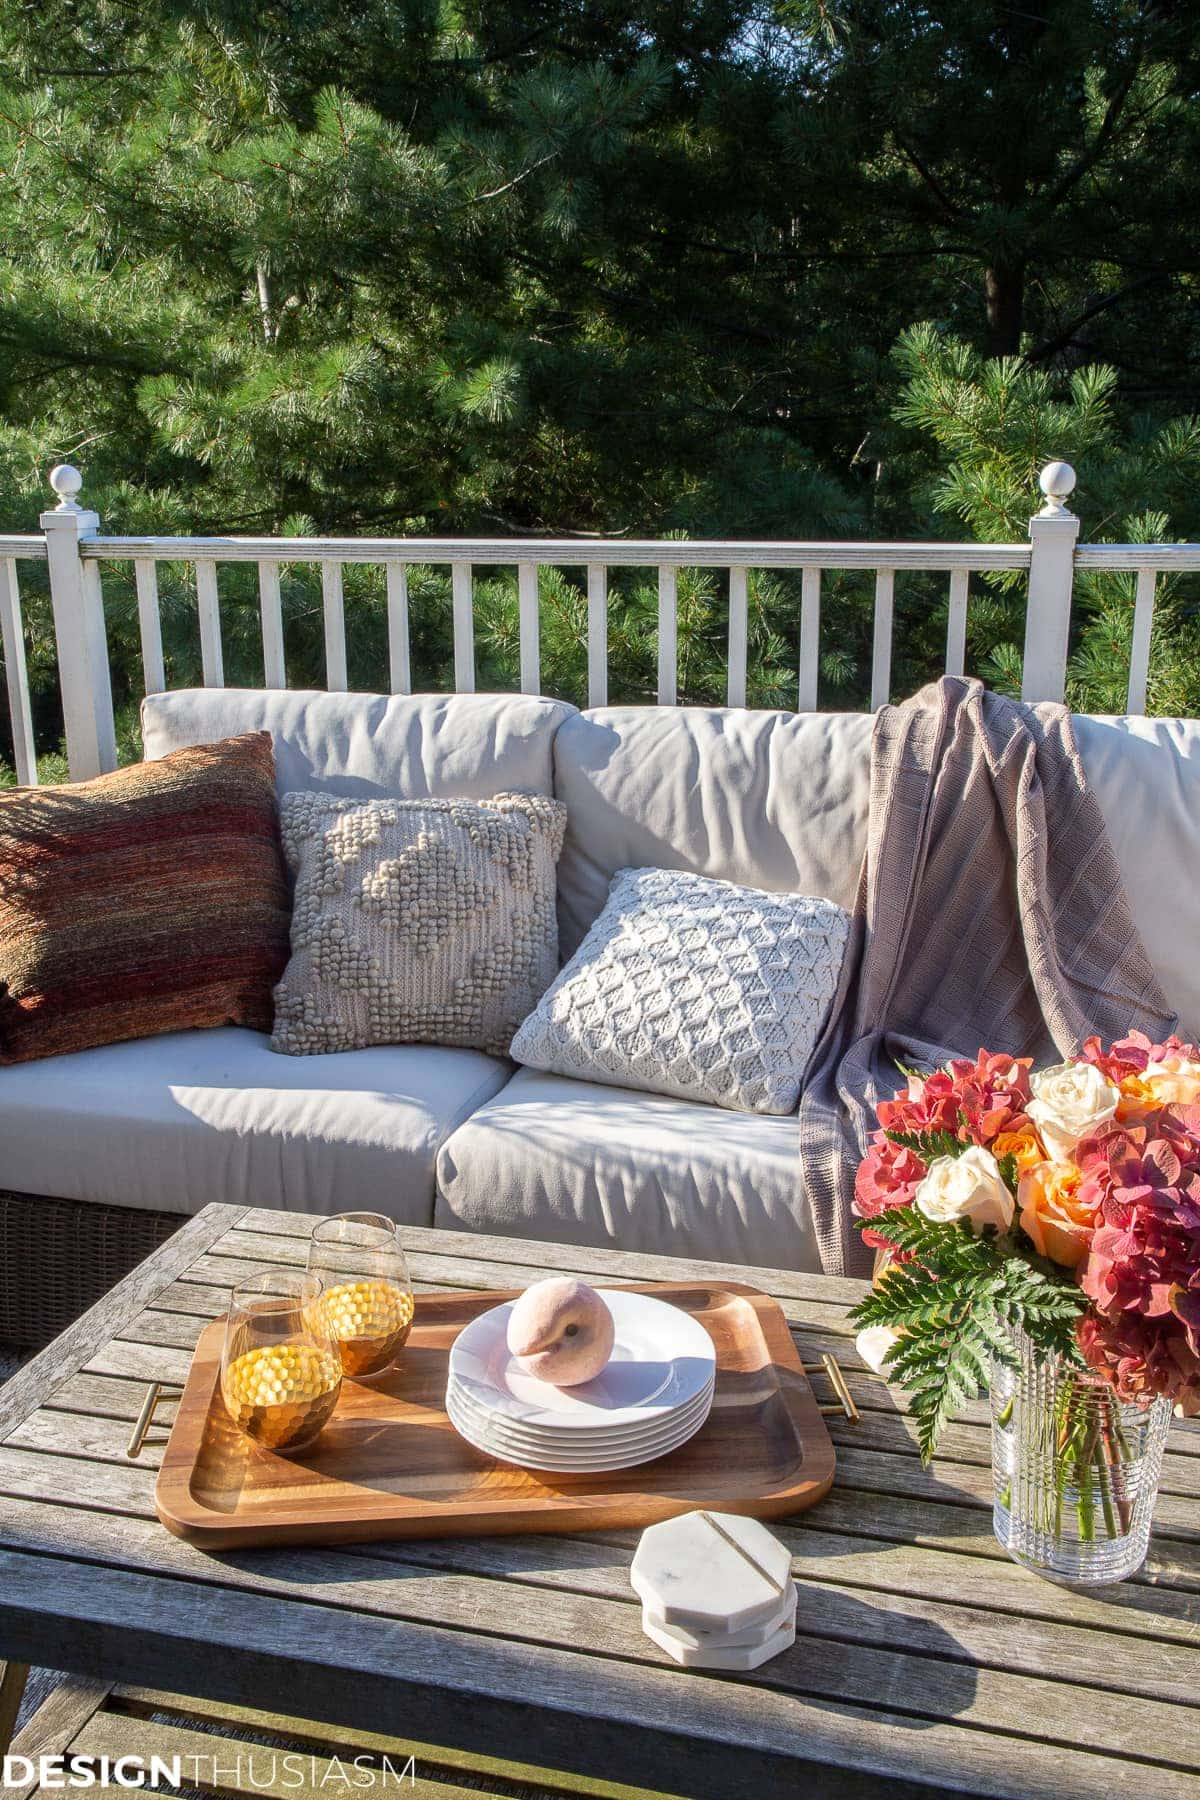 Home Style Saturdays 257 | Your Weekend Mini Lifestyle Magazine